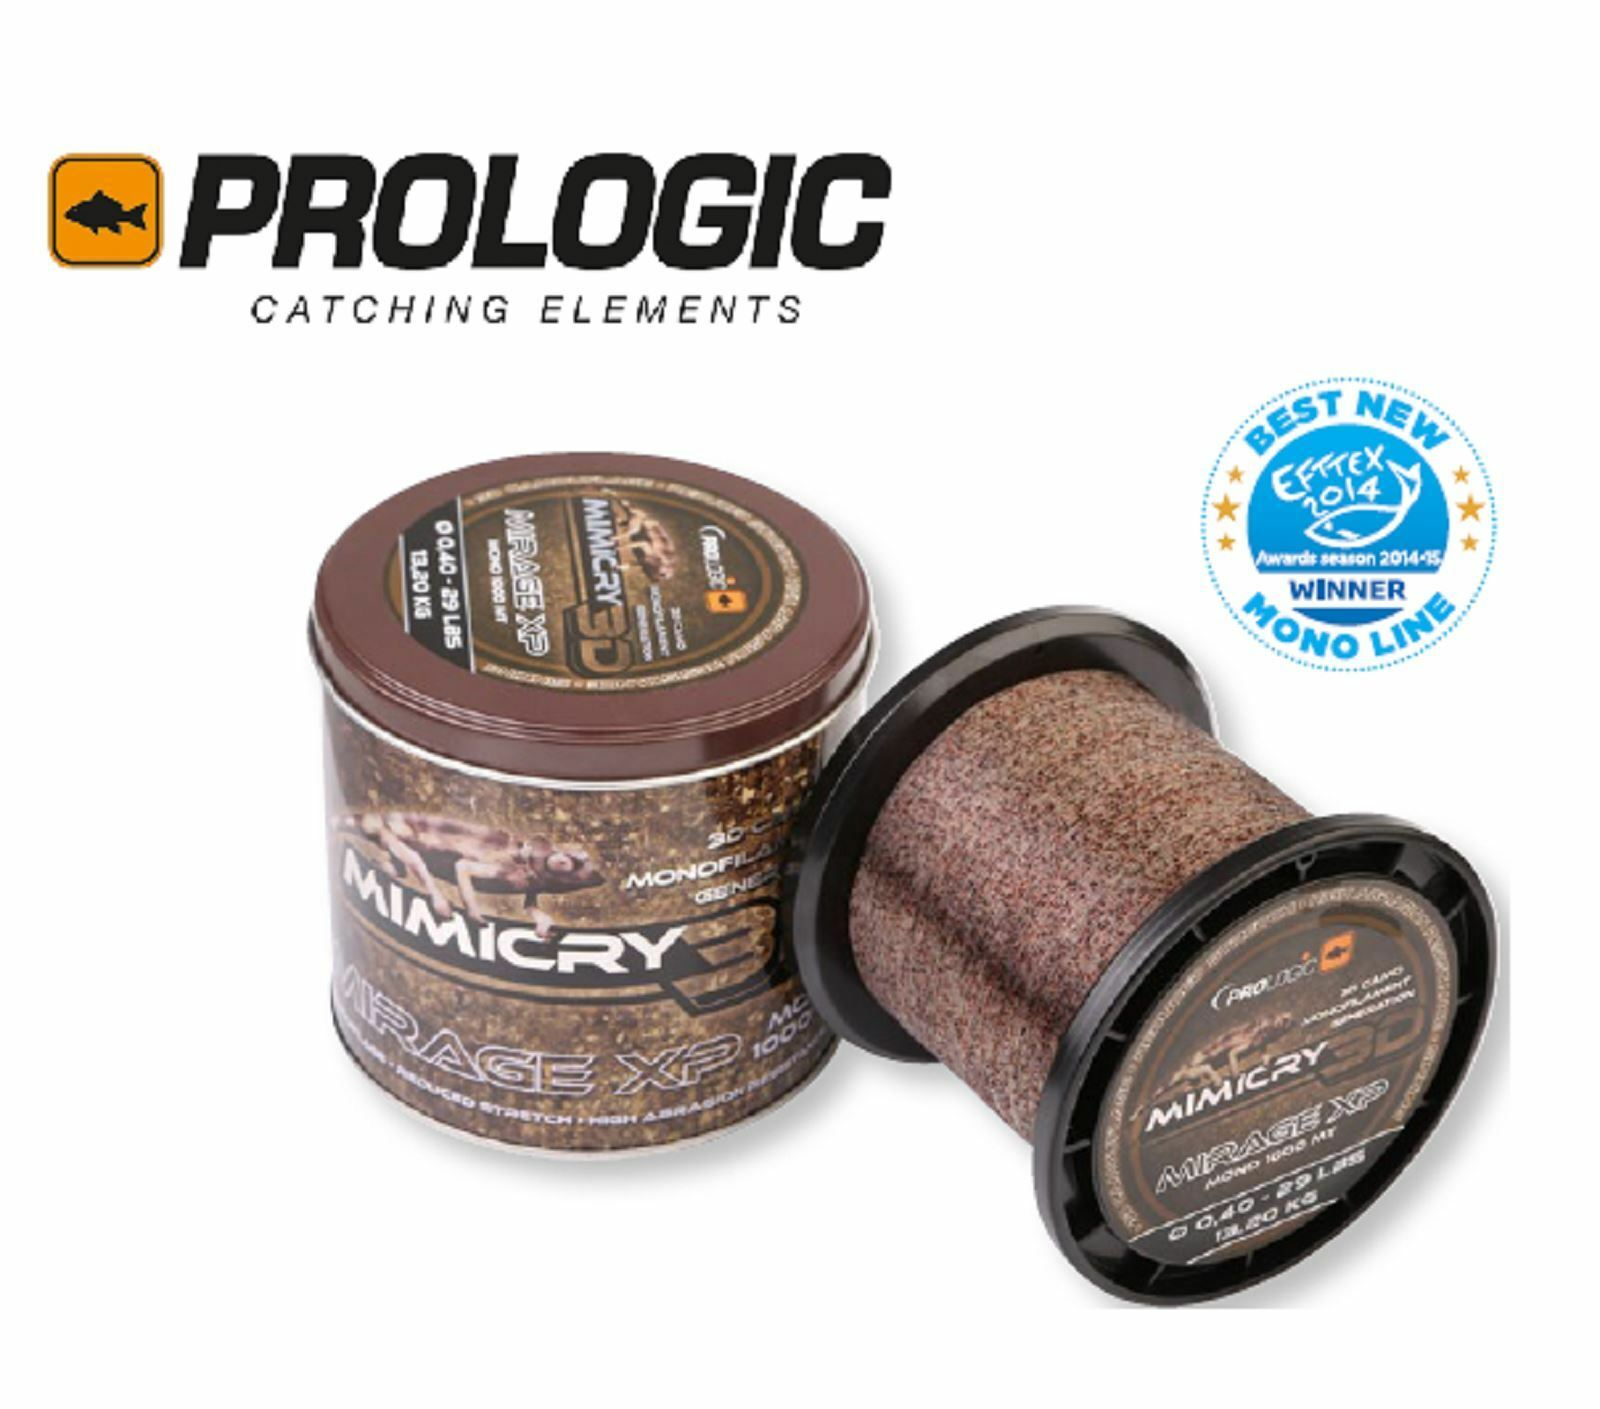 Prologic mimicry mirage xp Camouflage monofilaSiet line 1000m 0.25 - 0.35mm